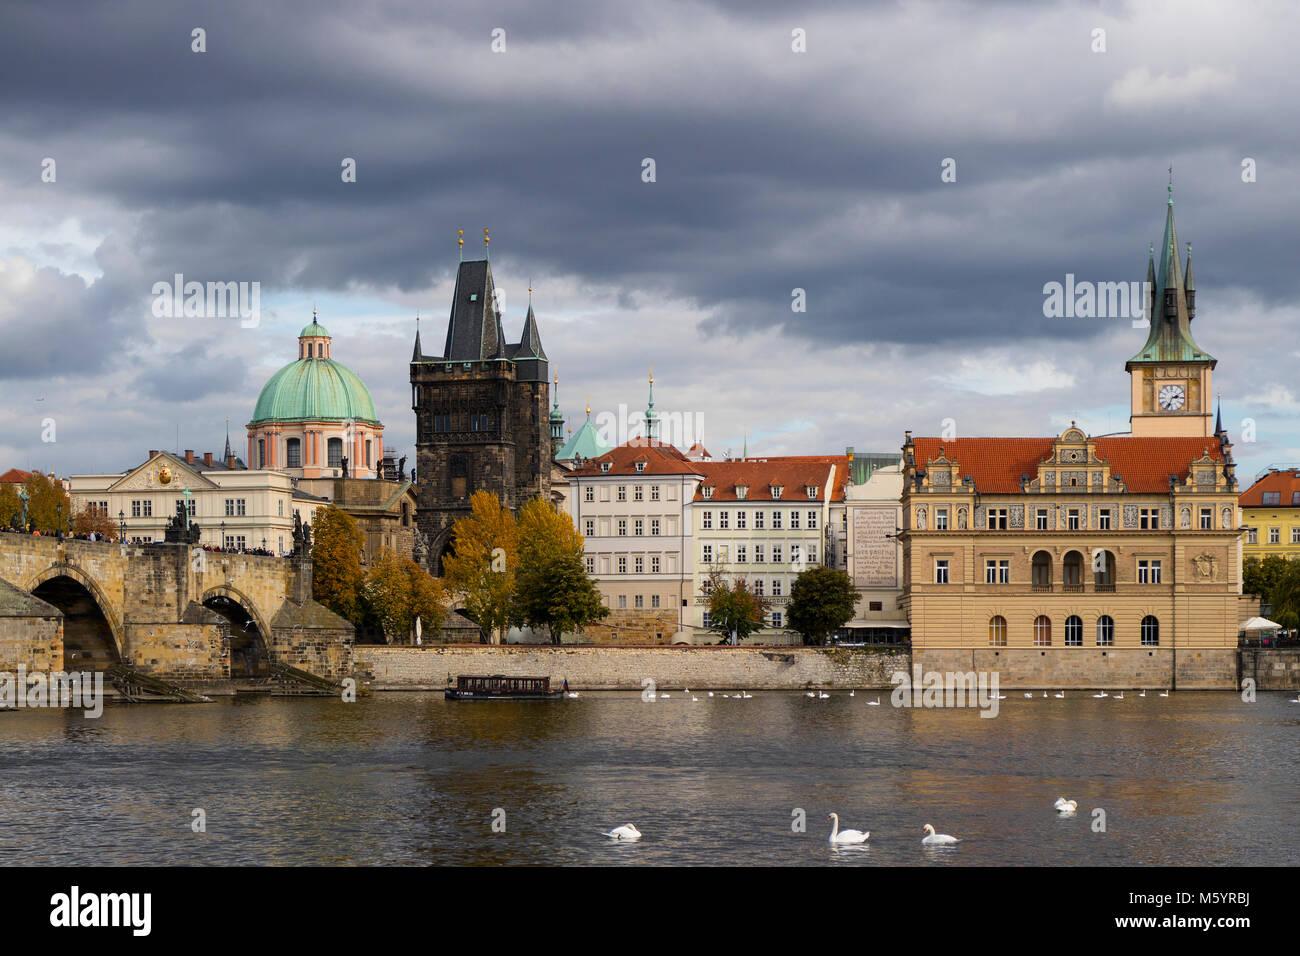 Prague, Czech Republic - October 9, 2017: Classic Czech buildings and Smetana Museum along the Vltava River in Prague - Stock Image